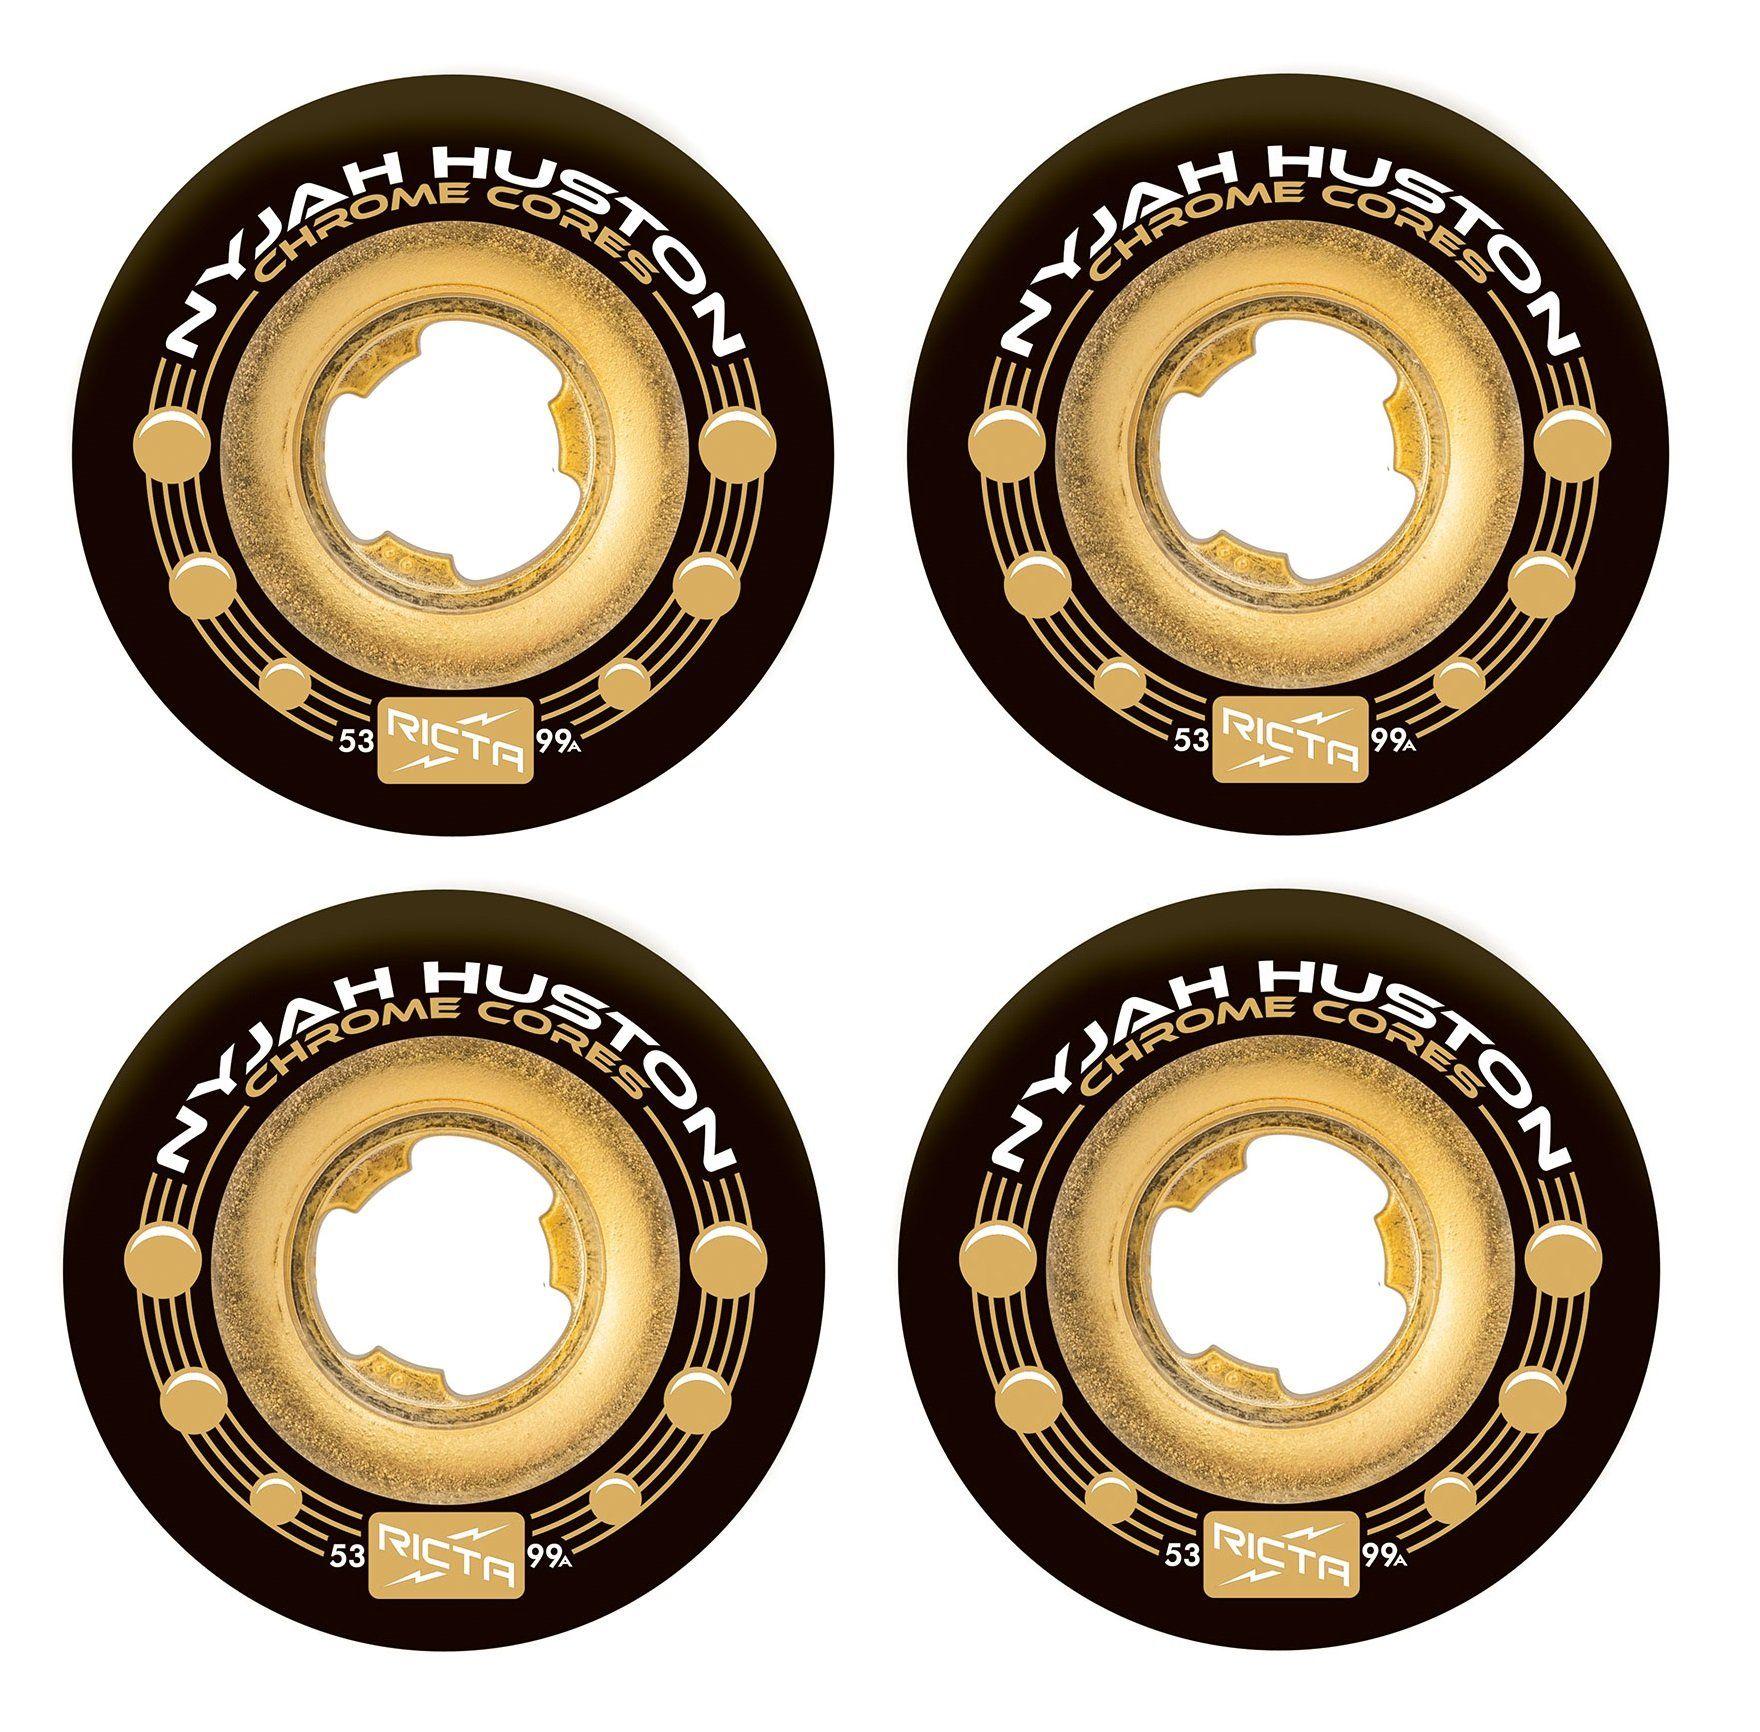 Ricta Nyjah Huston Chrome Core Skateboard Wheels | 53mm 99A